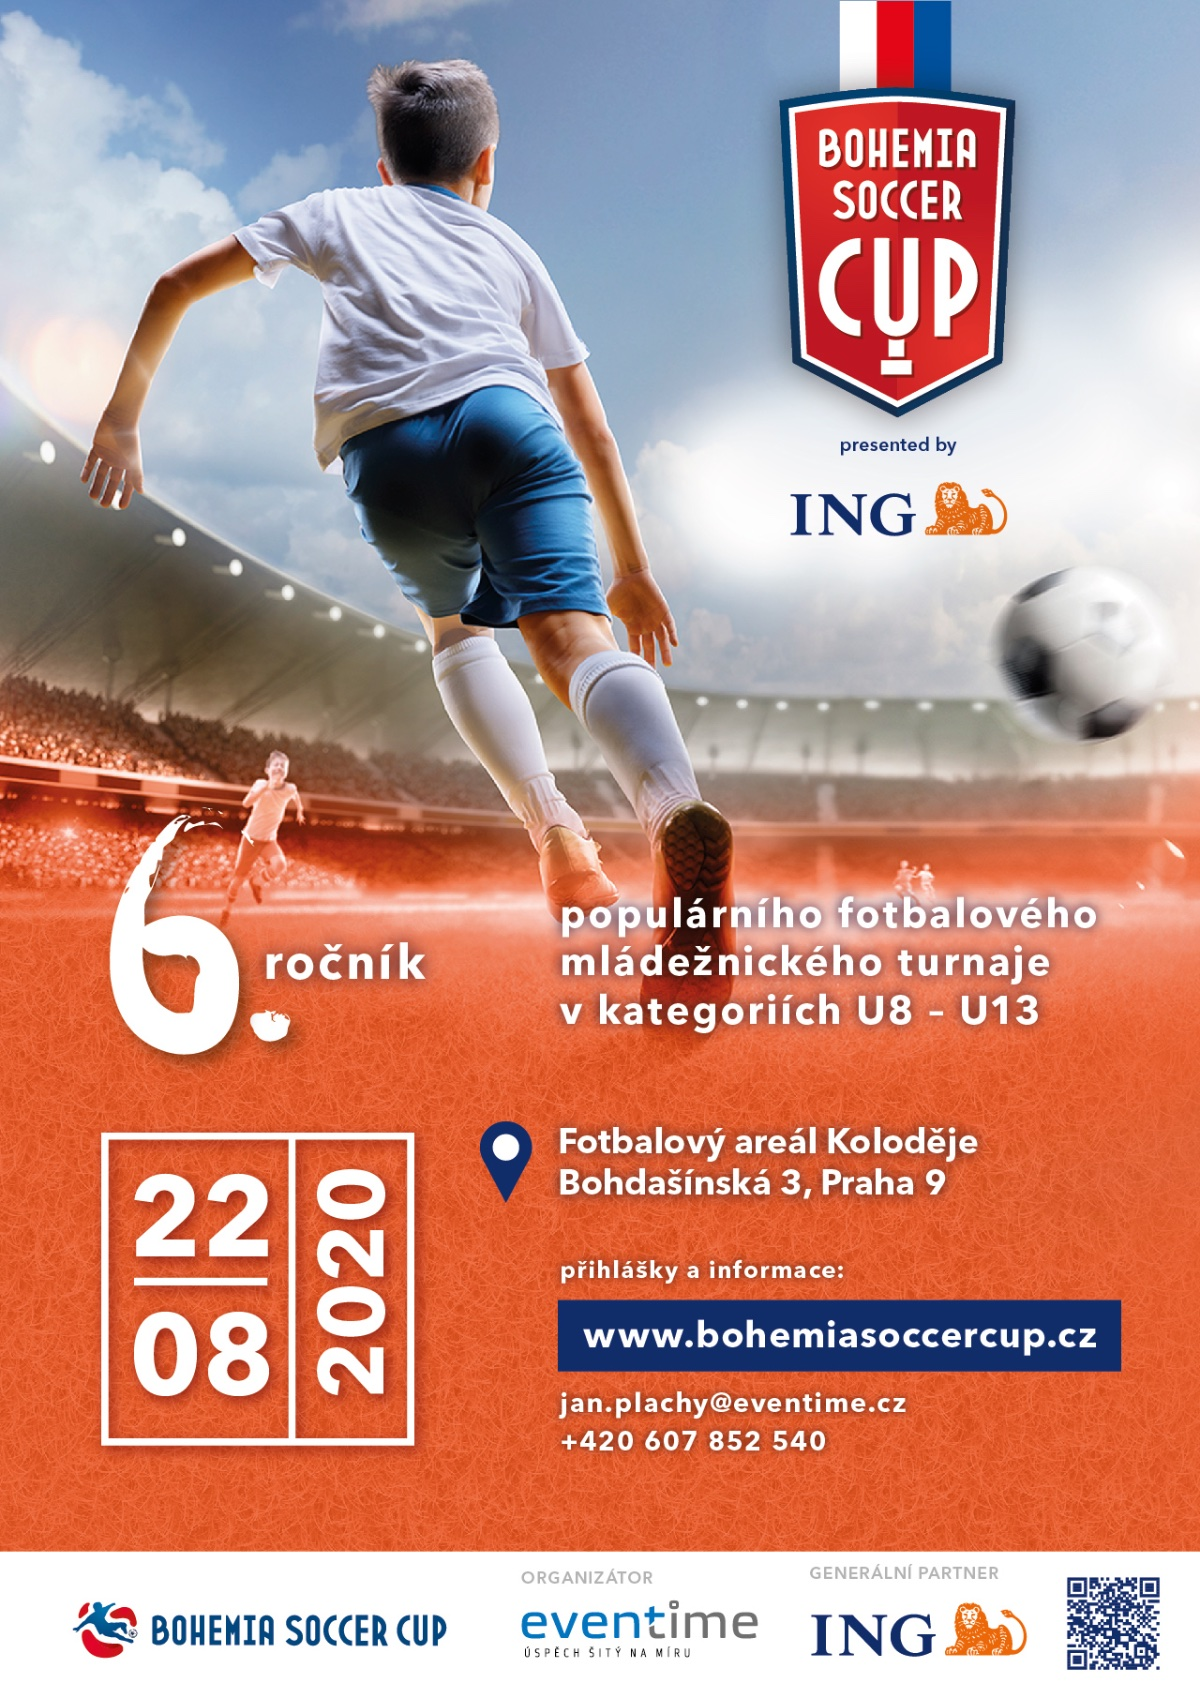 ING Bohemia Soccer Cup 2020